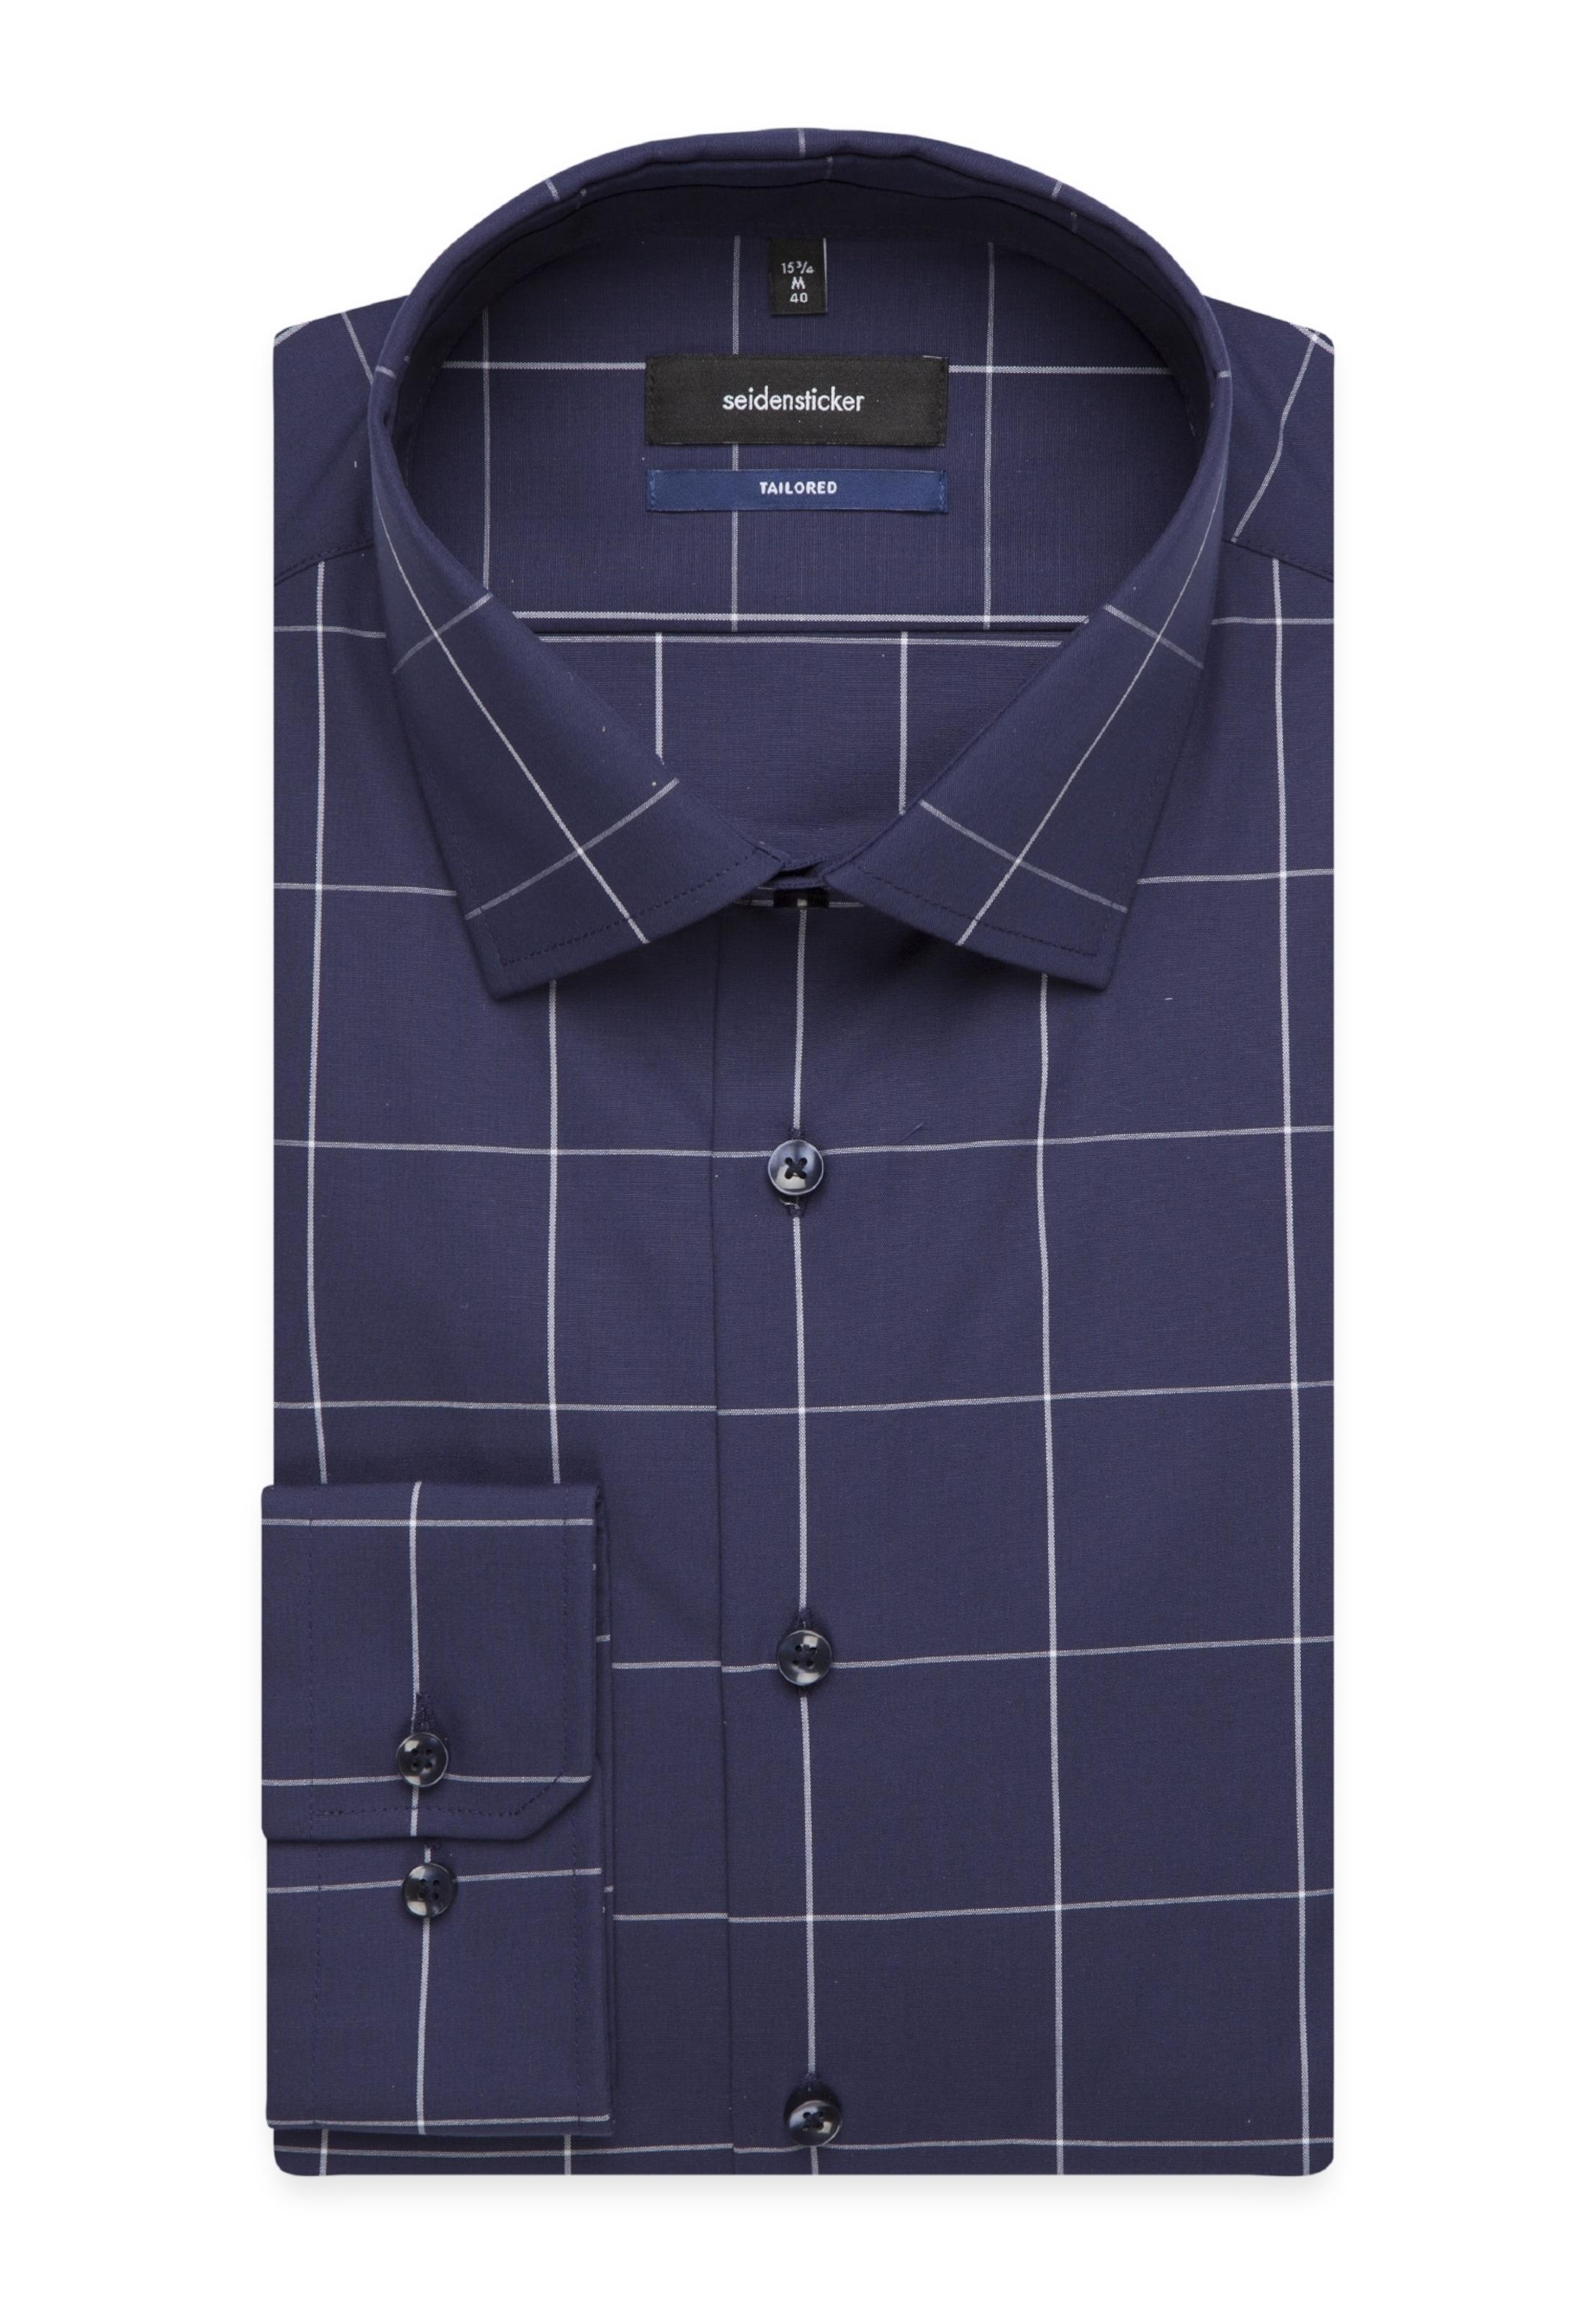 Chemise Seidensticker En Business FoncéBlanc ' Tailored Bleu 34LAR5j